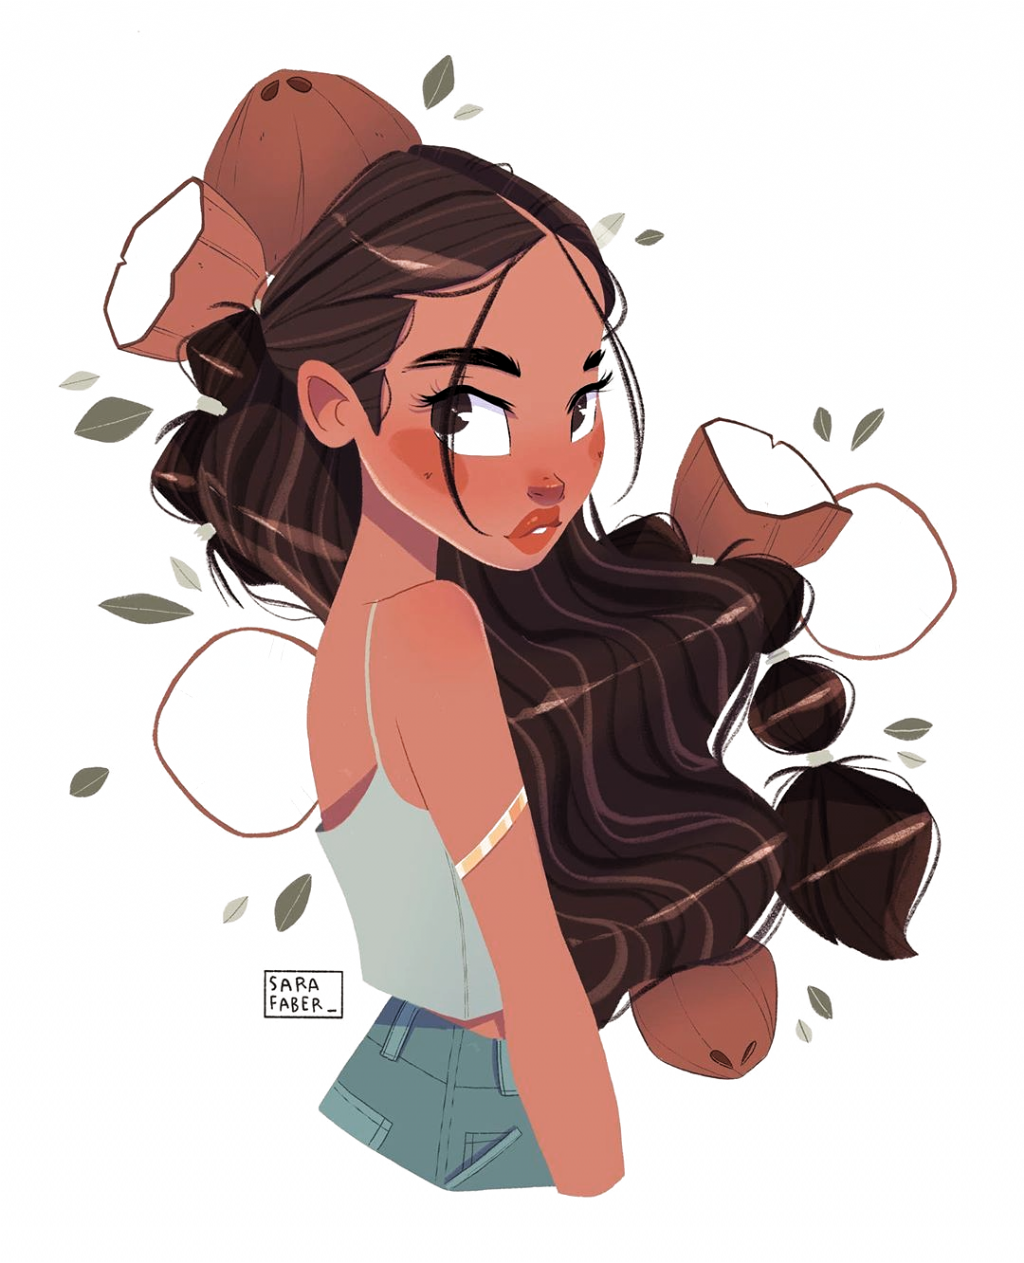 Sara Faber On Instagram Coconut Girl Drawing Digitalart Ipadpro Procreate Myart Charac In 2020 Girls Cartoon Art Cartoon Girl Drawing Girl Drawing Sketches